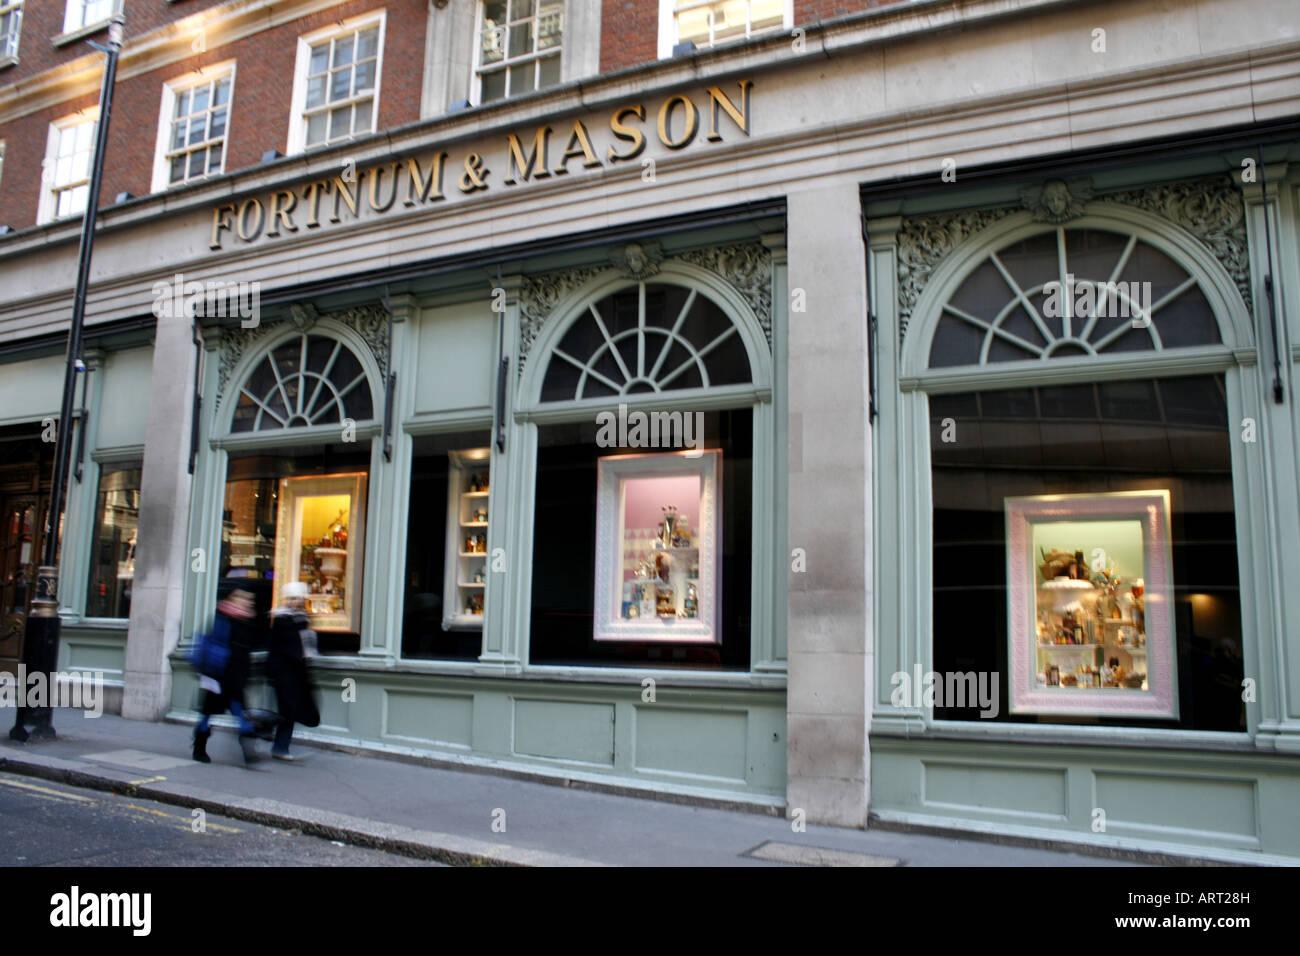 fortnum & mason department store piccadilly london uk 2008 - Stock Image